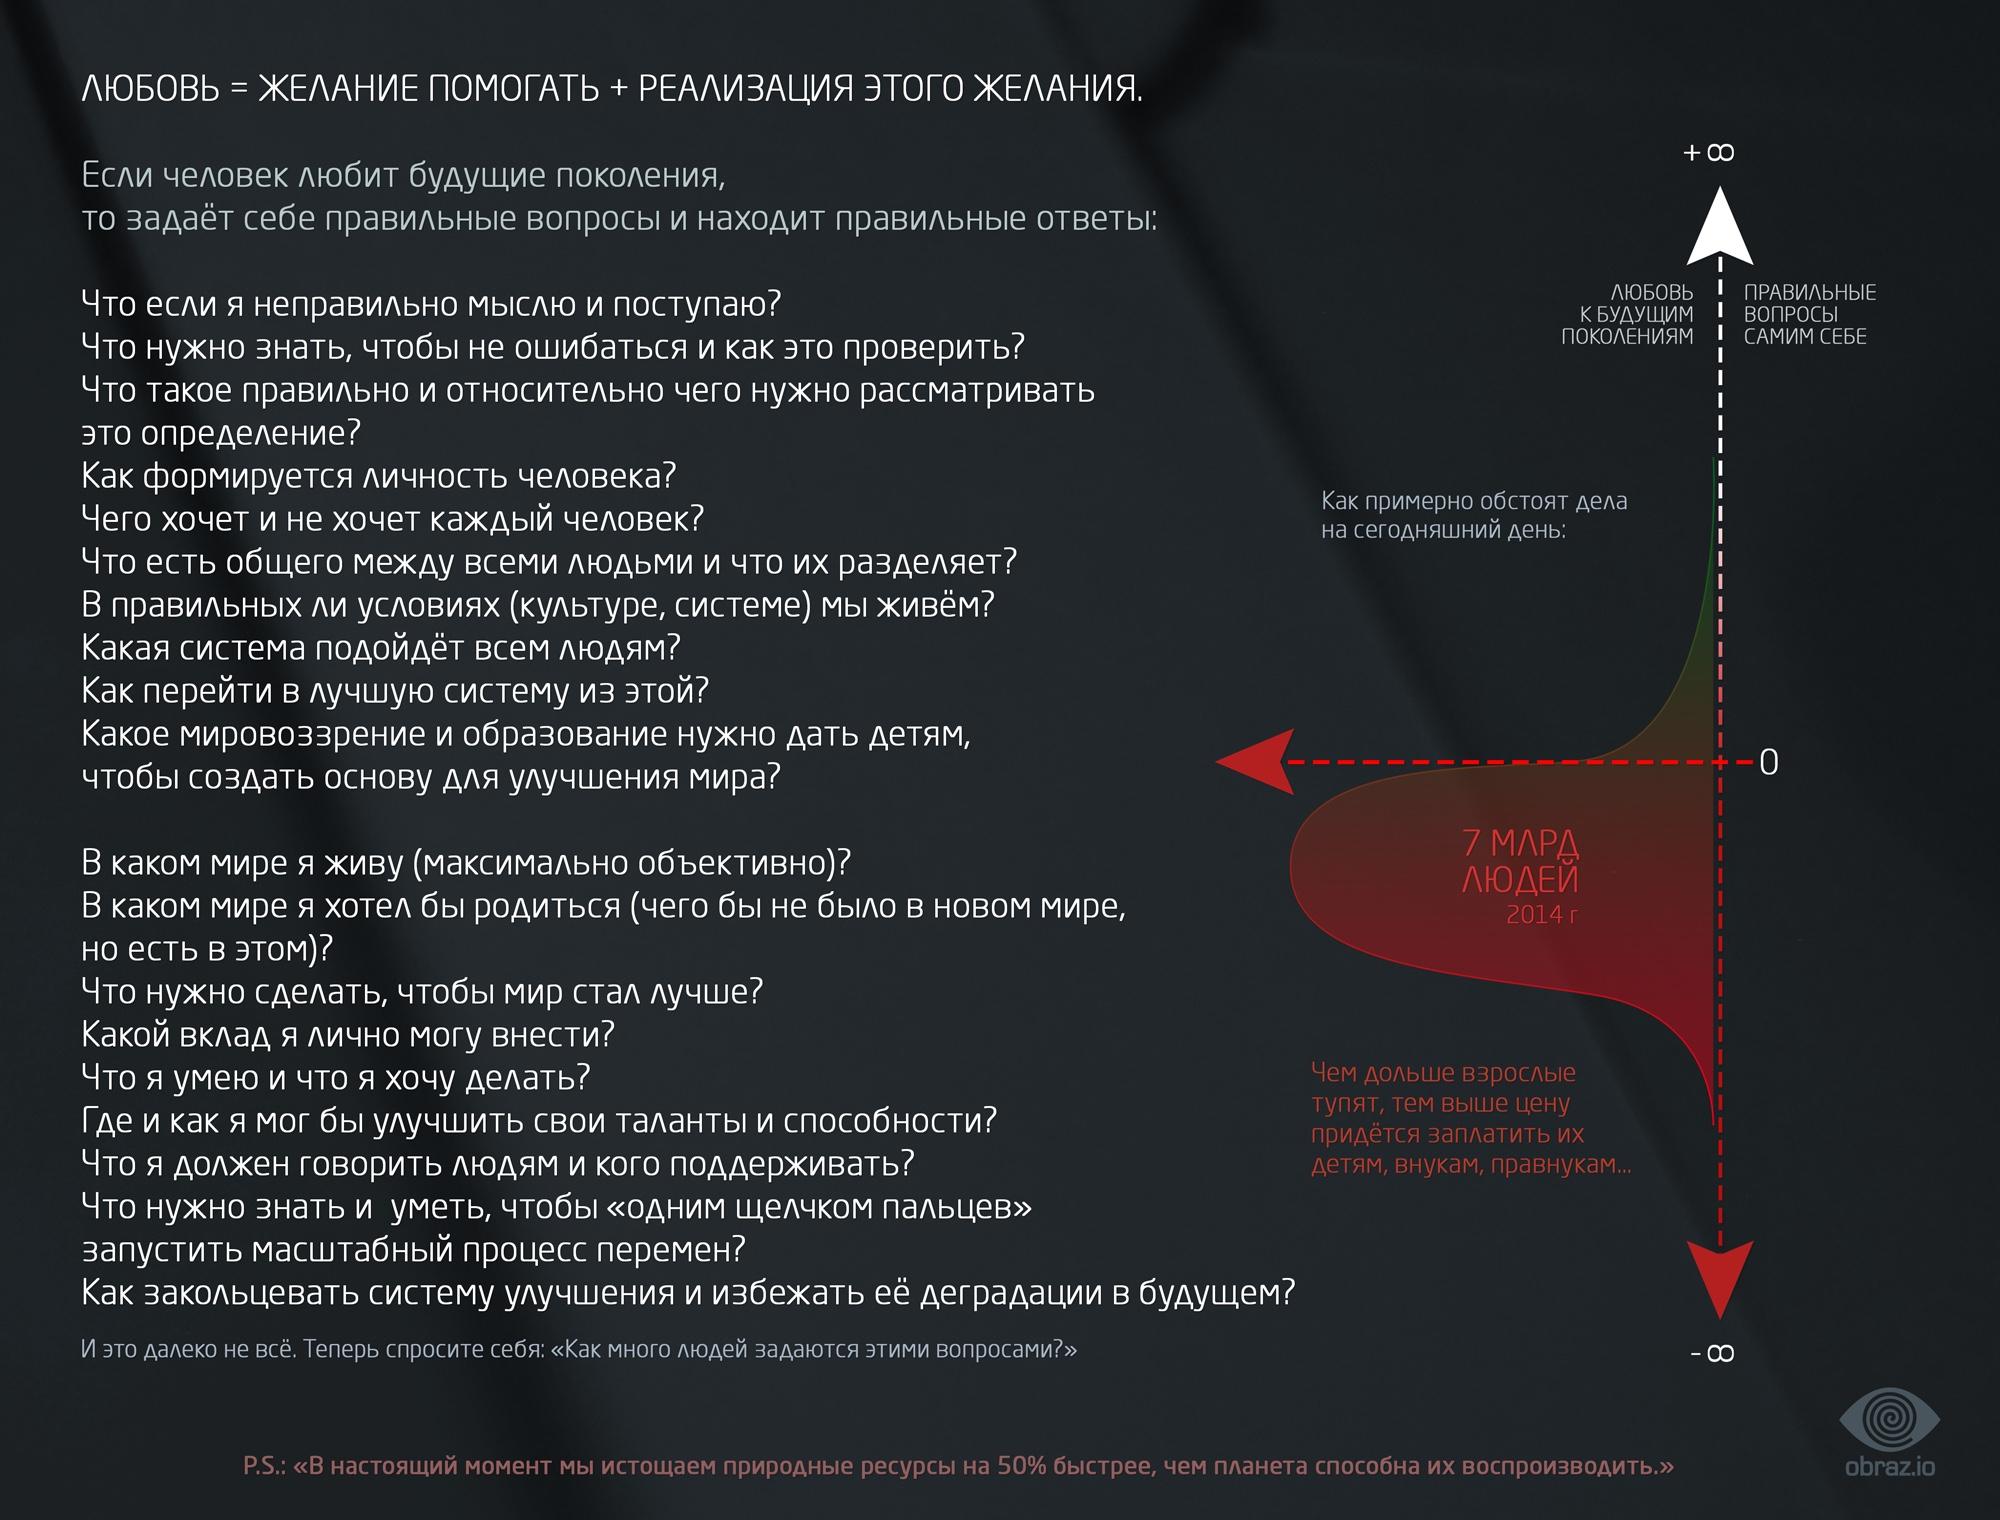 Email:learningkurakov@gmail com3292 1ra2tww.457npi7ldi